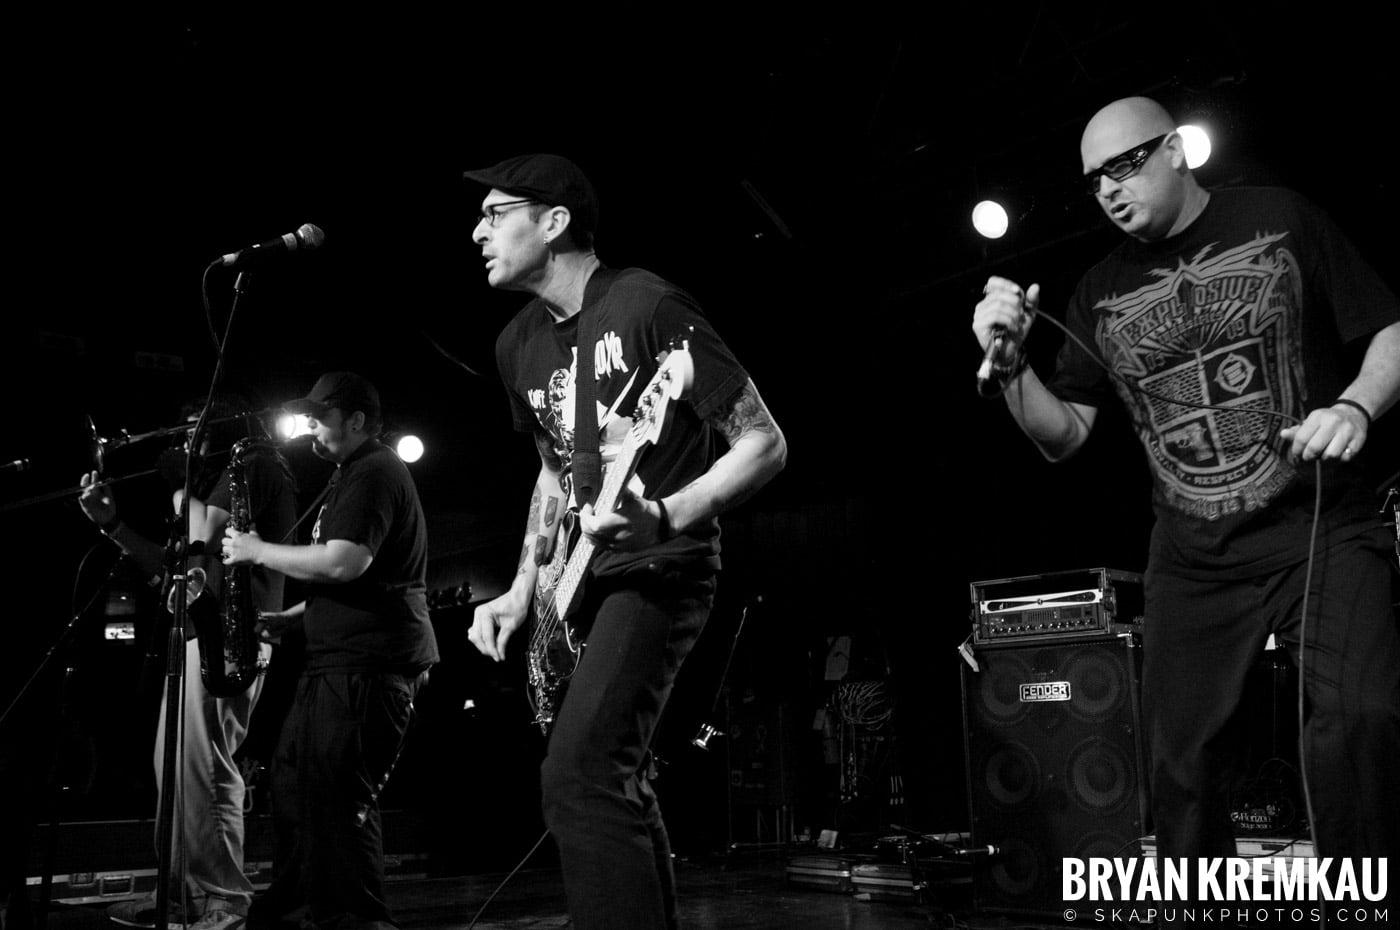 Voodoo Glow Skulls (Ska is Dead Tour) @ Starland Ballroom, Sayreville, NJ - 11.15.09 (17)